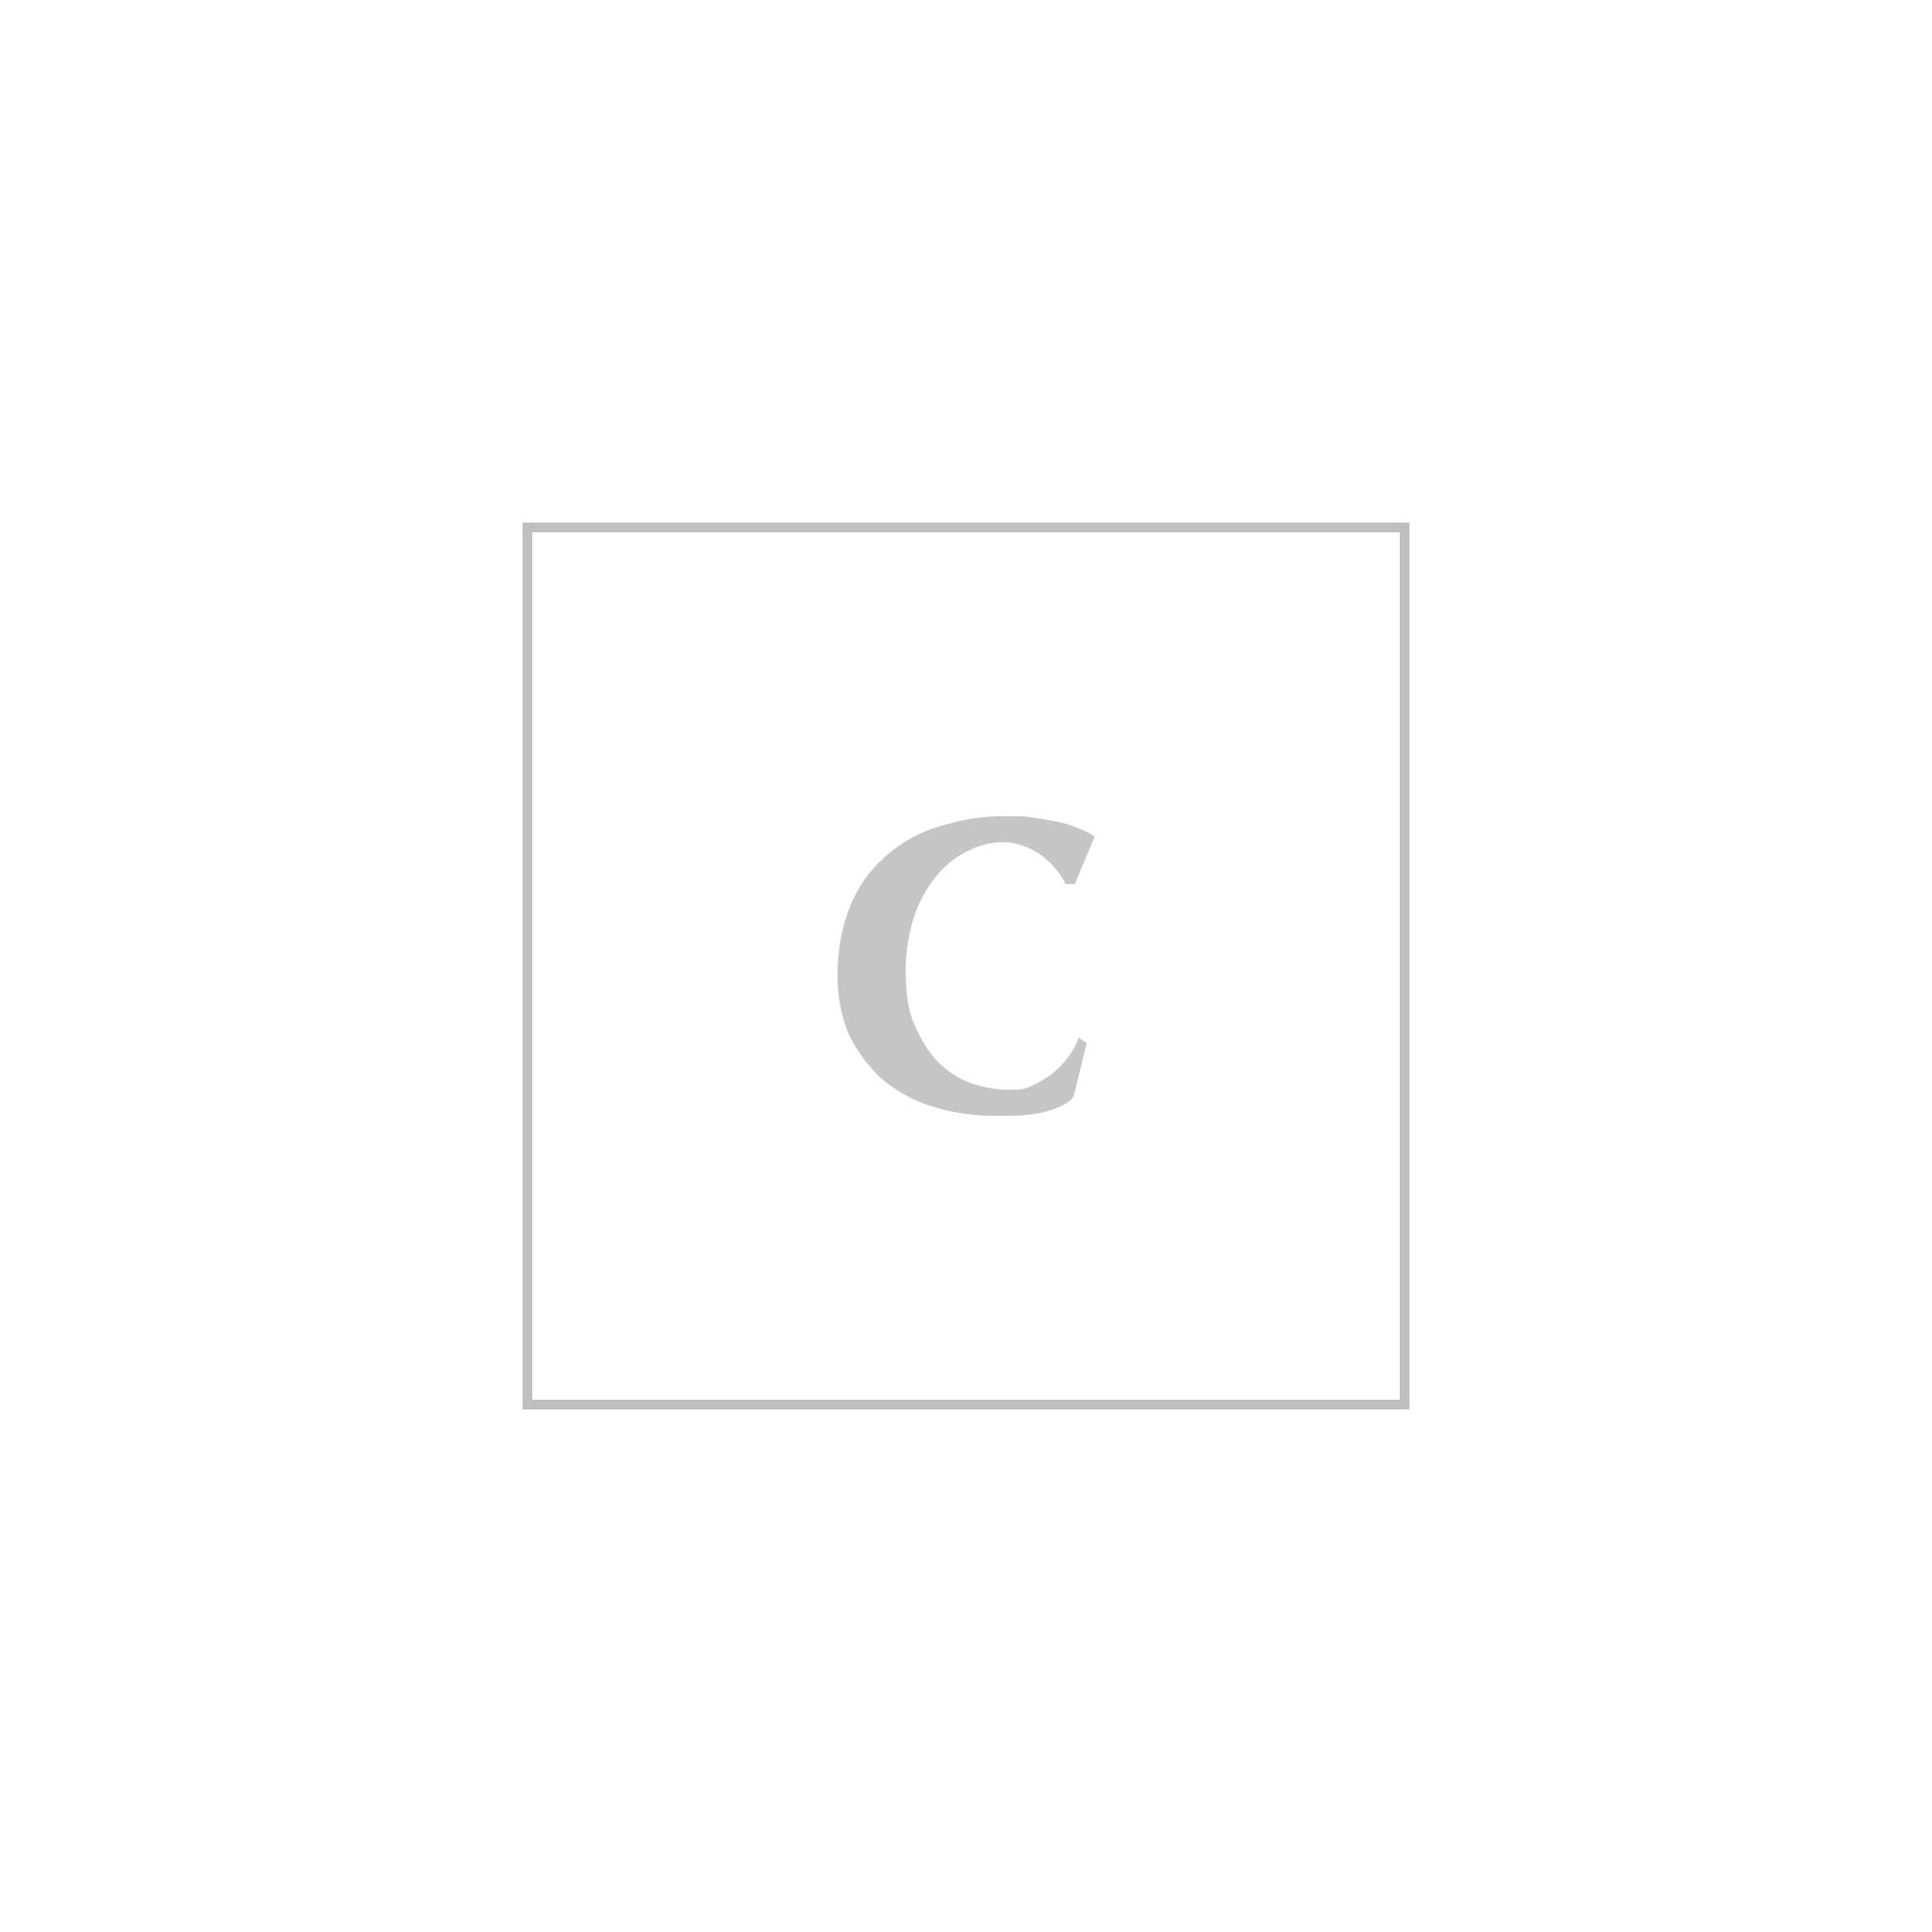 Dolce & gabbana mini bags vernice stampa+ayers